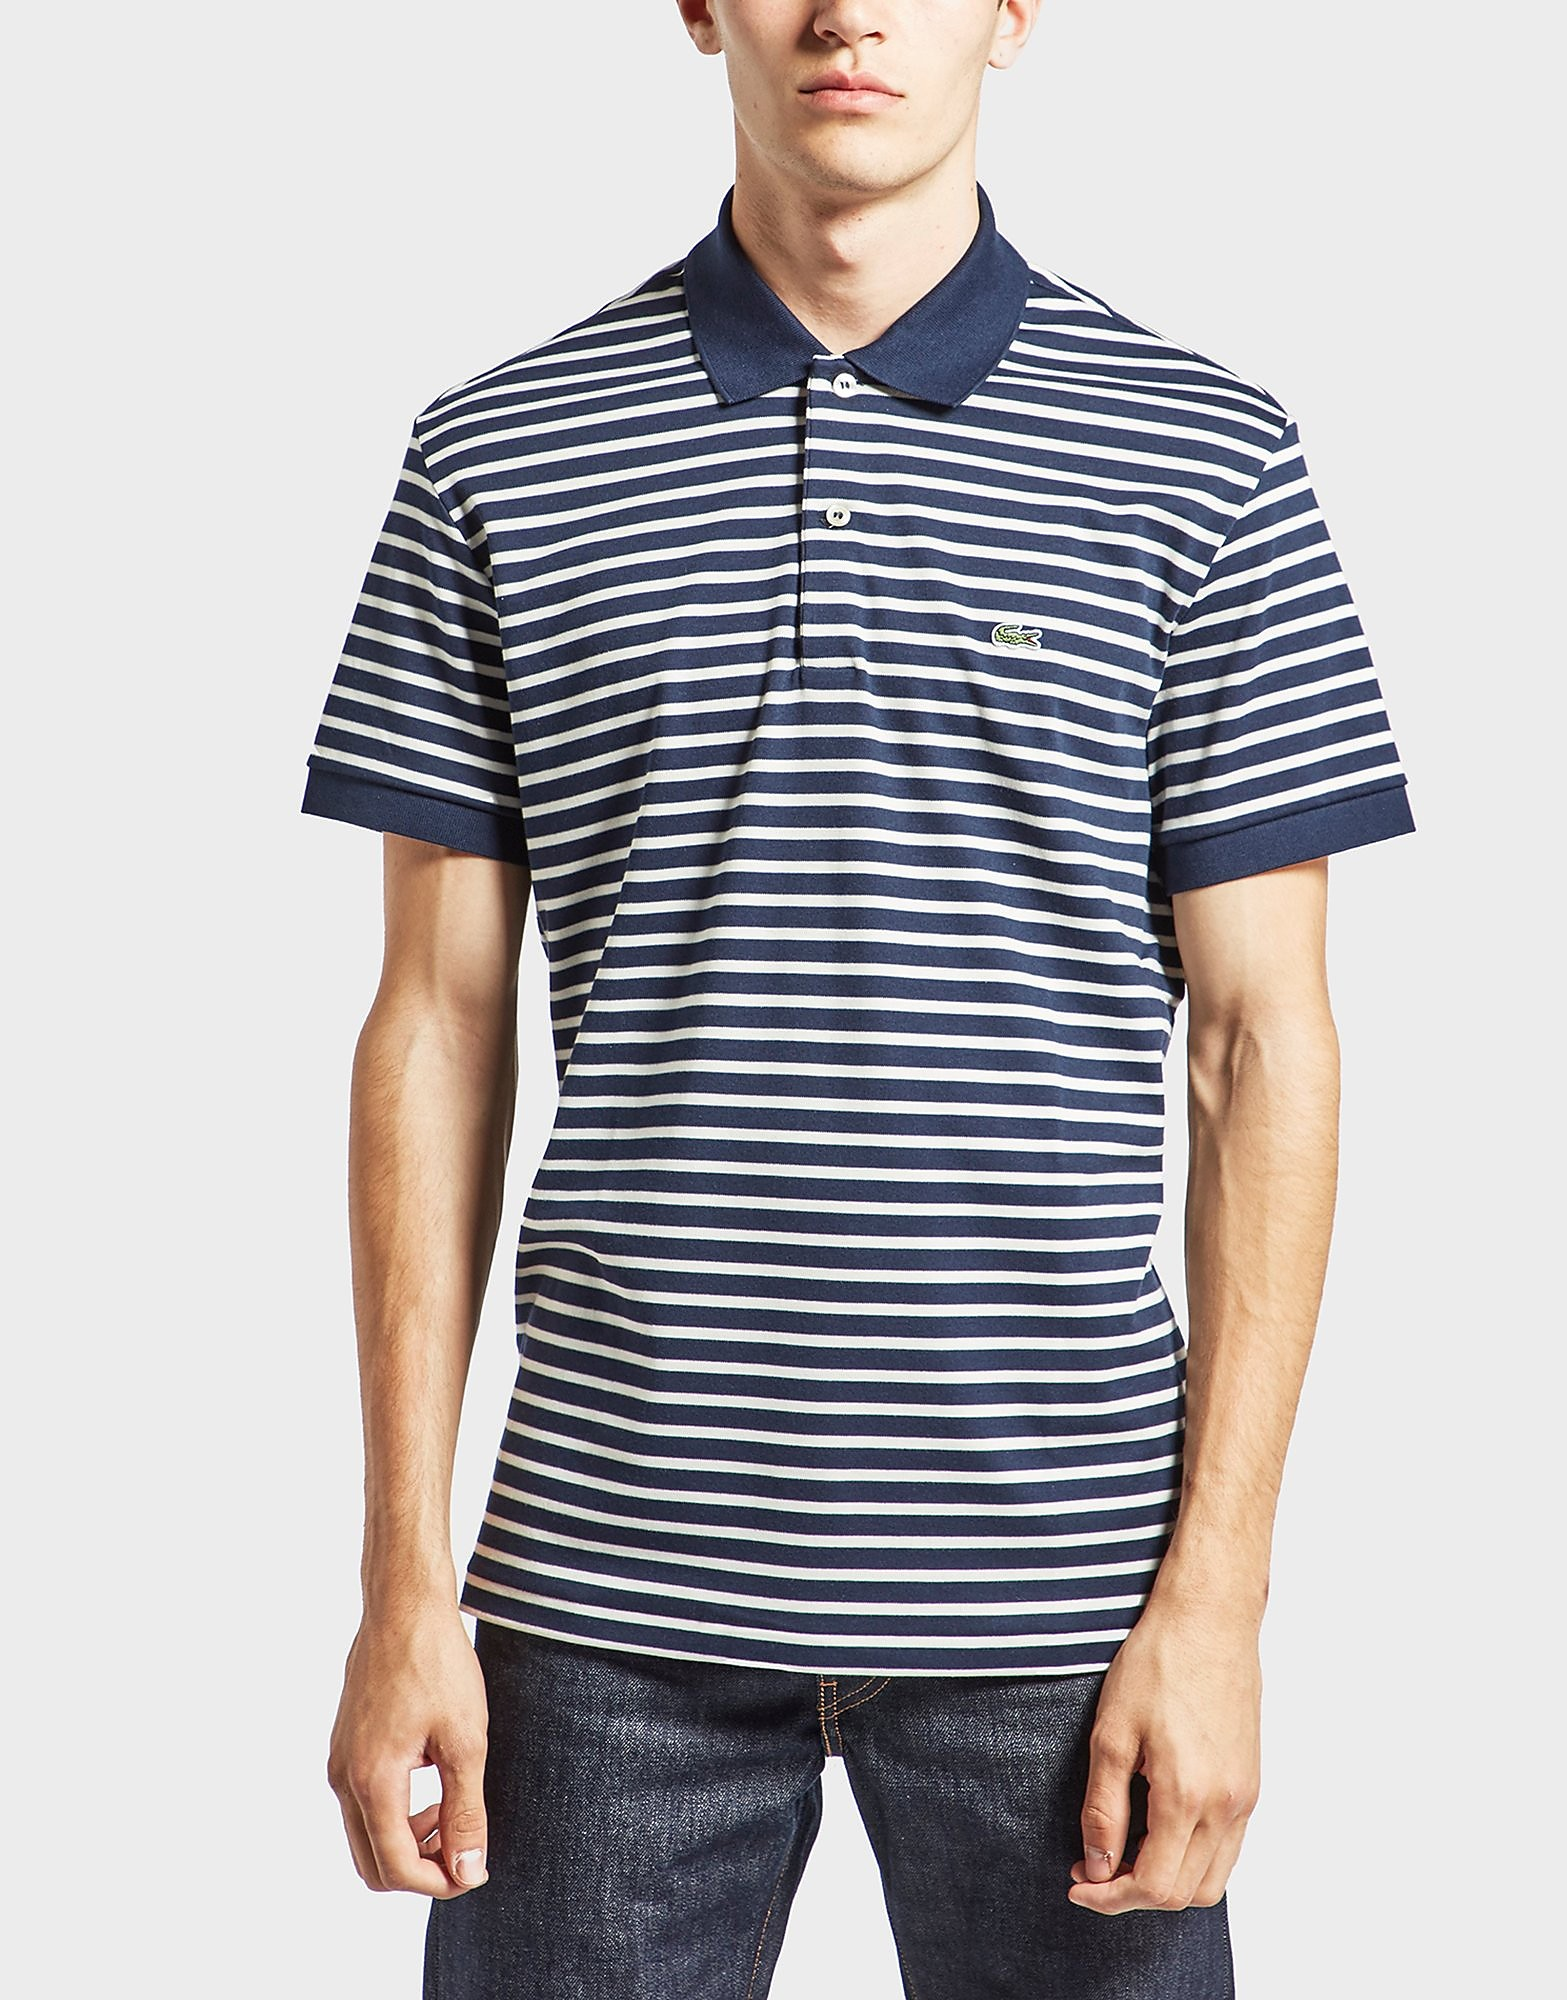 Lacoste Horizontal Stripe Polo Shirt